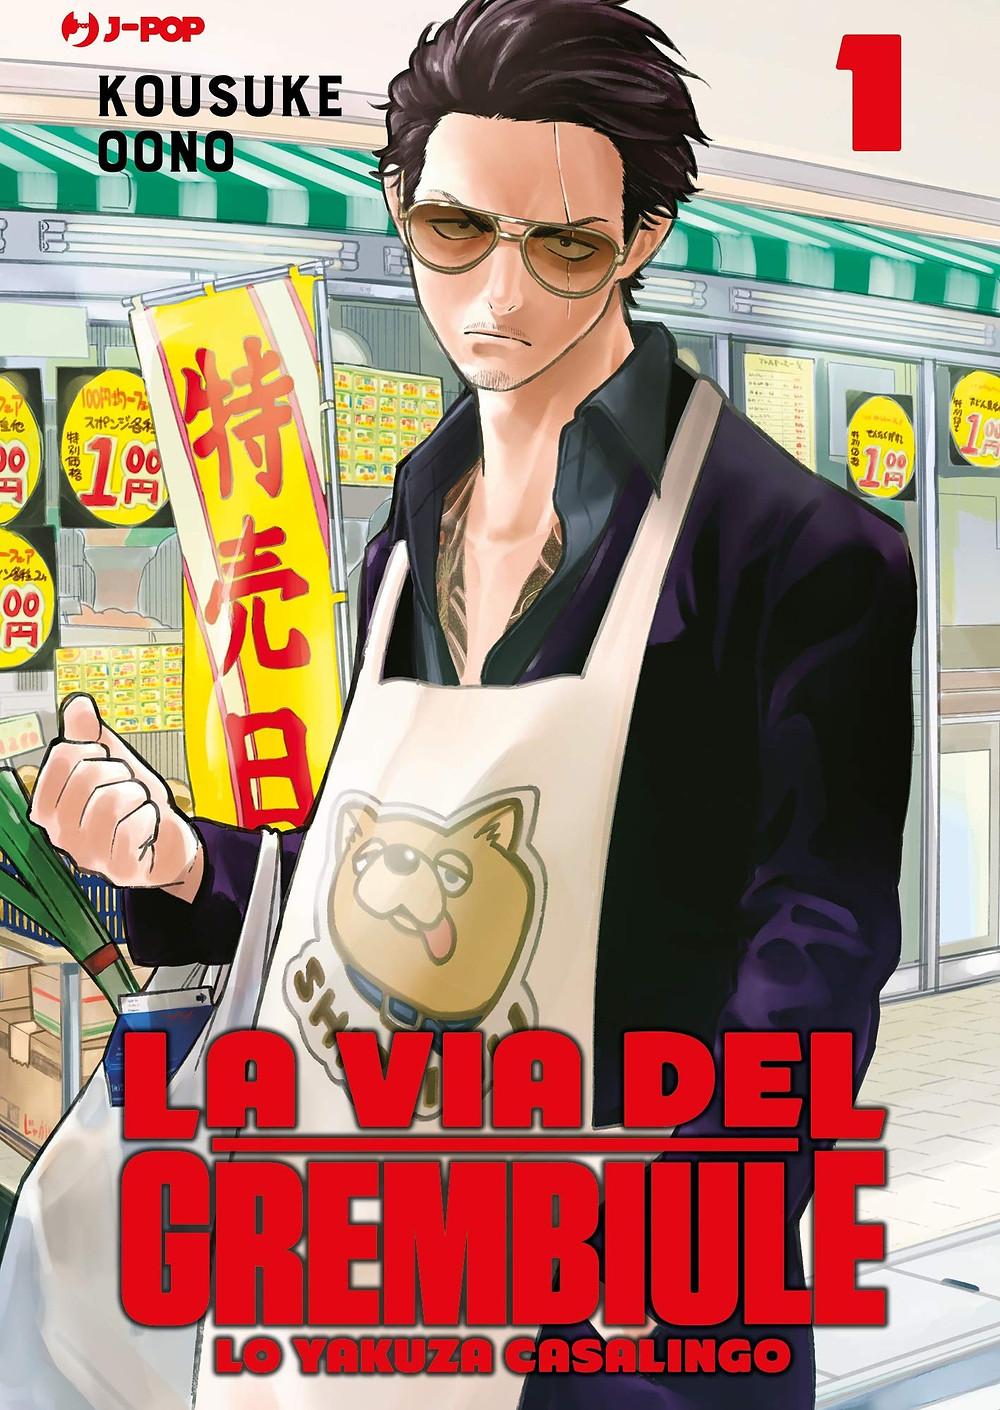 La via del grembiule - lo yakuza casalingo cookingwiththehamster